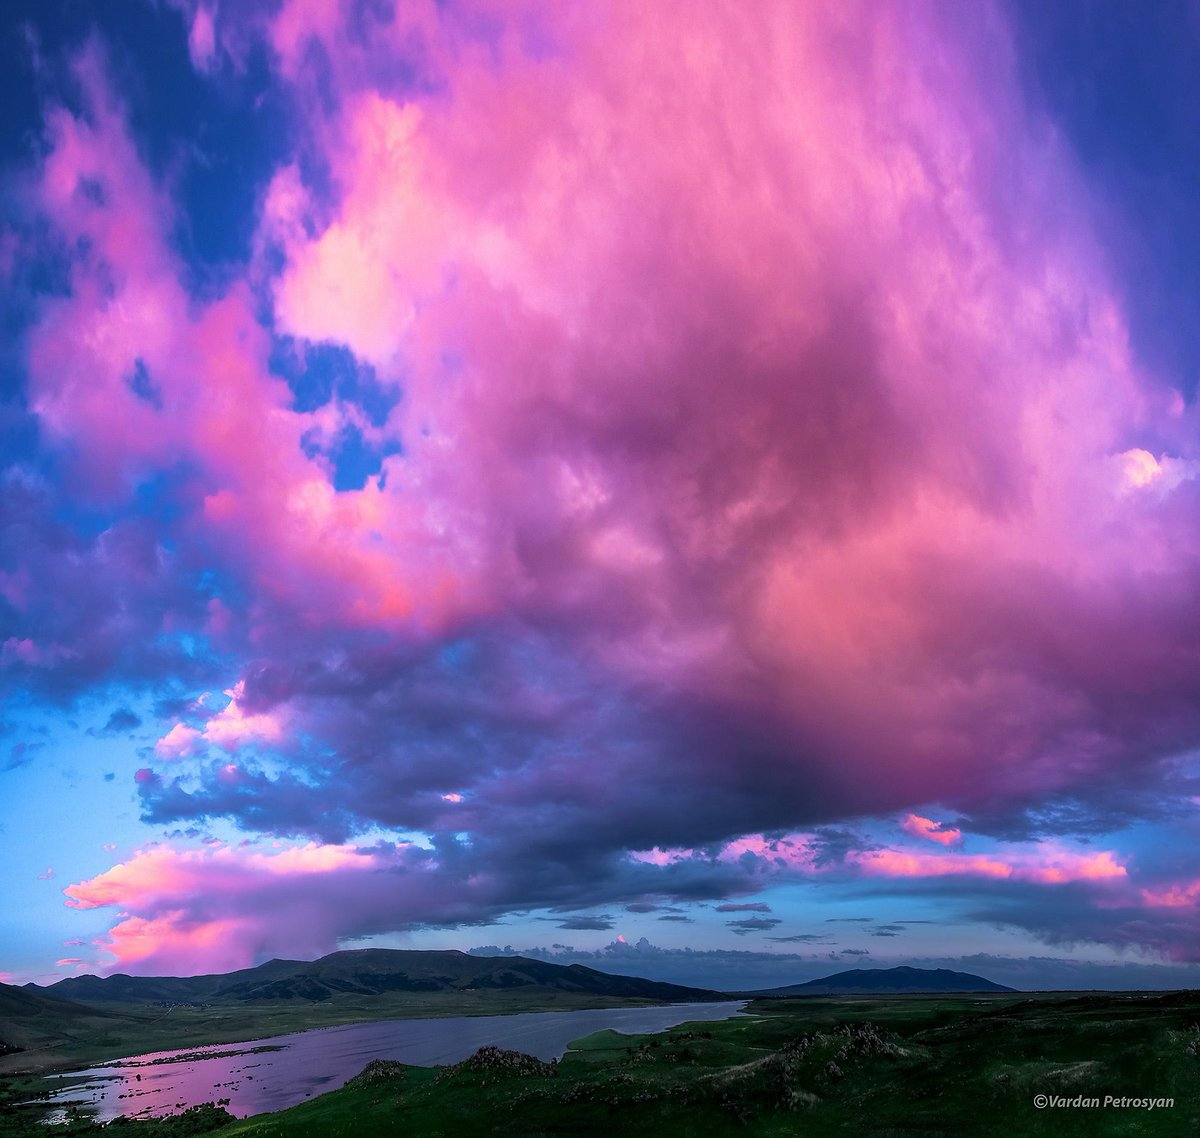 картинки с облаками розовыми